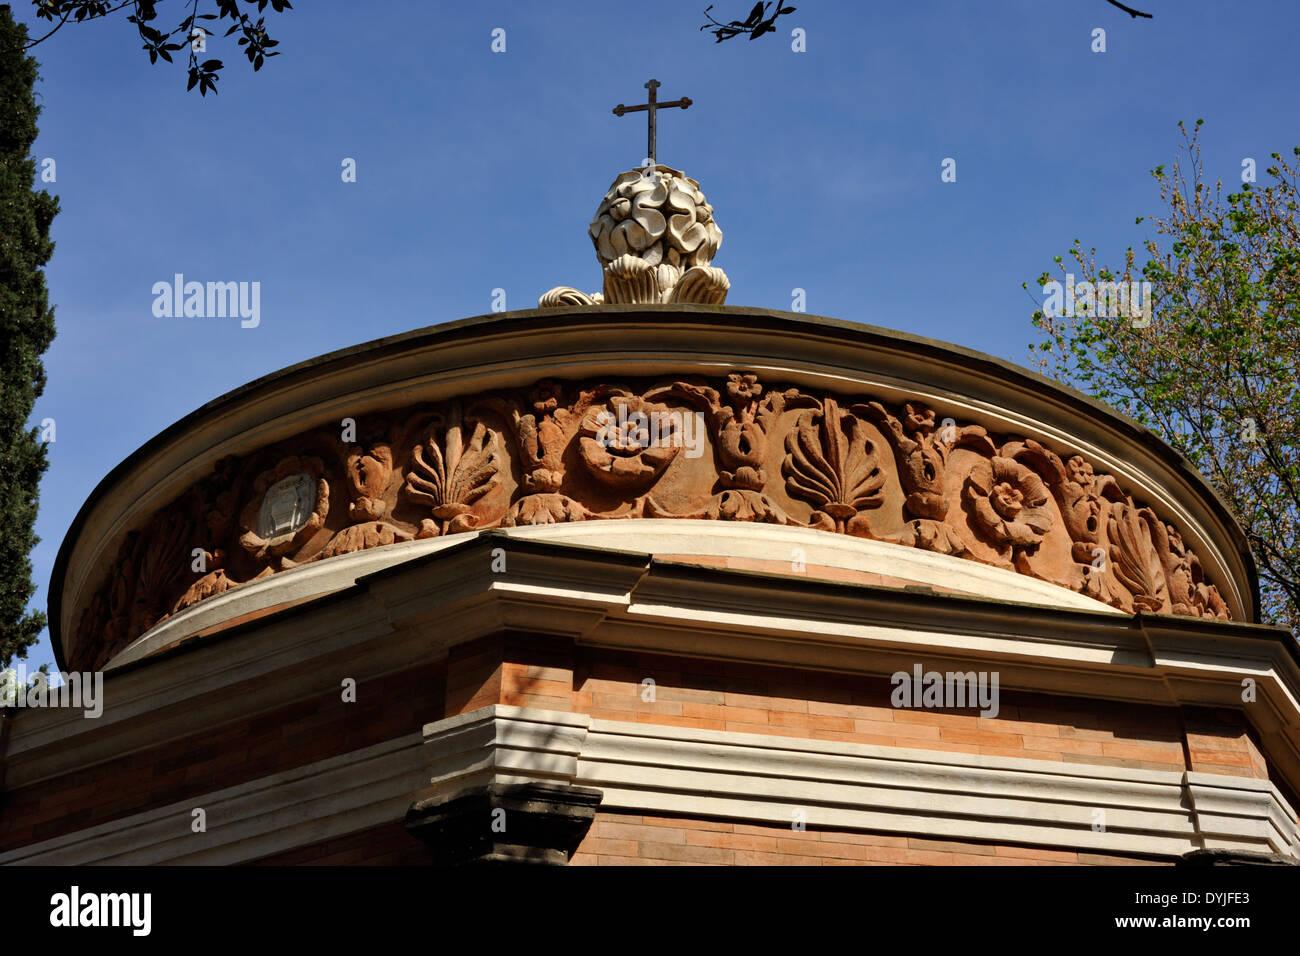 italy, rome, oratory of san giovanni in oleo, borromini frieze - Stock Image